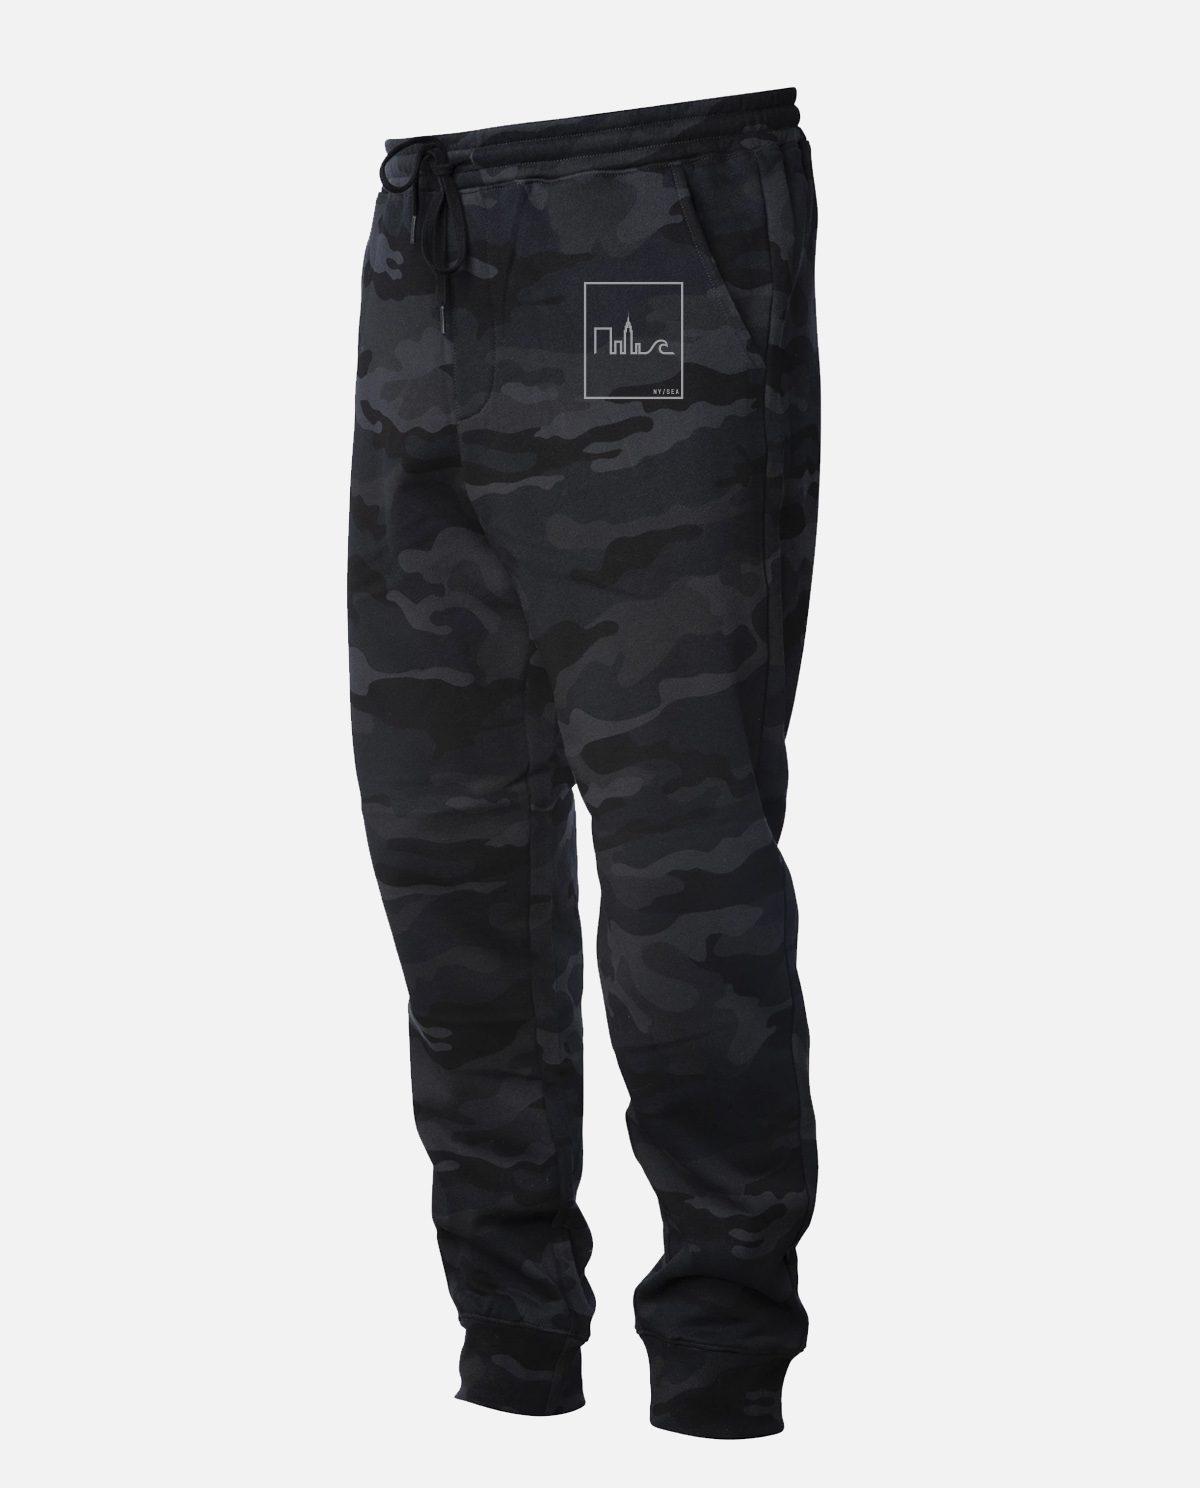 nysea-20wintercollection_skyline-sweatpants-camo